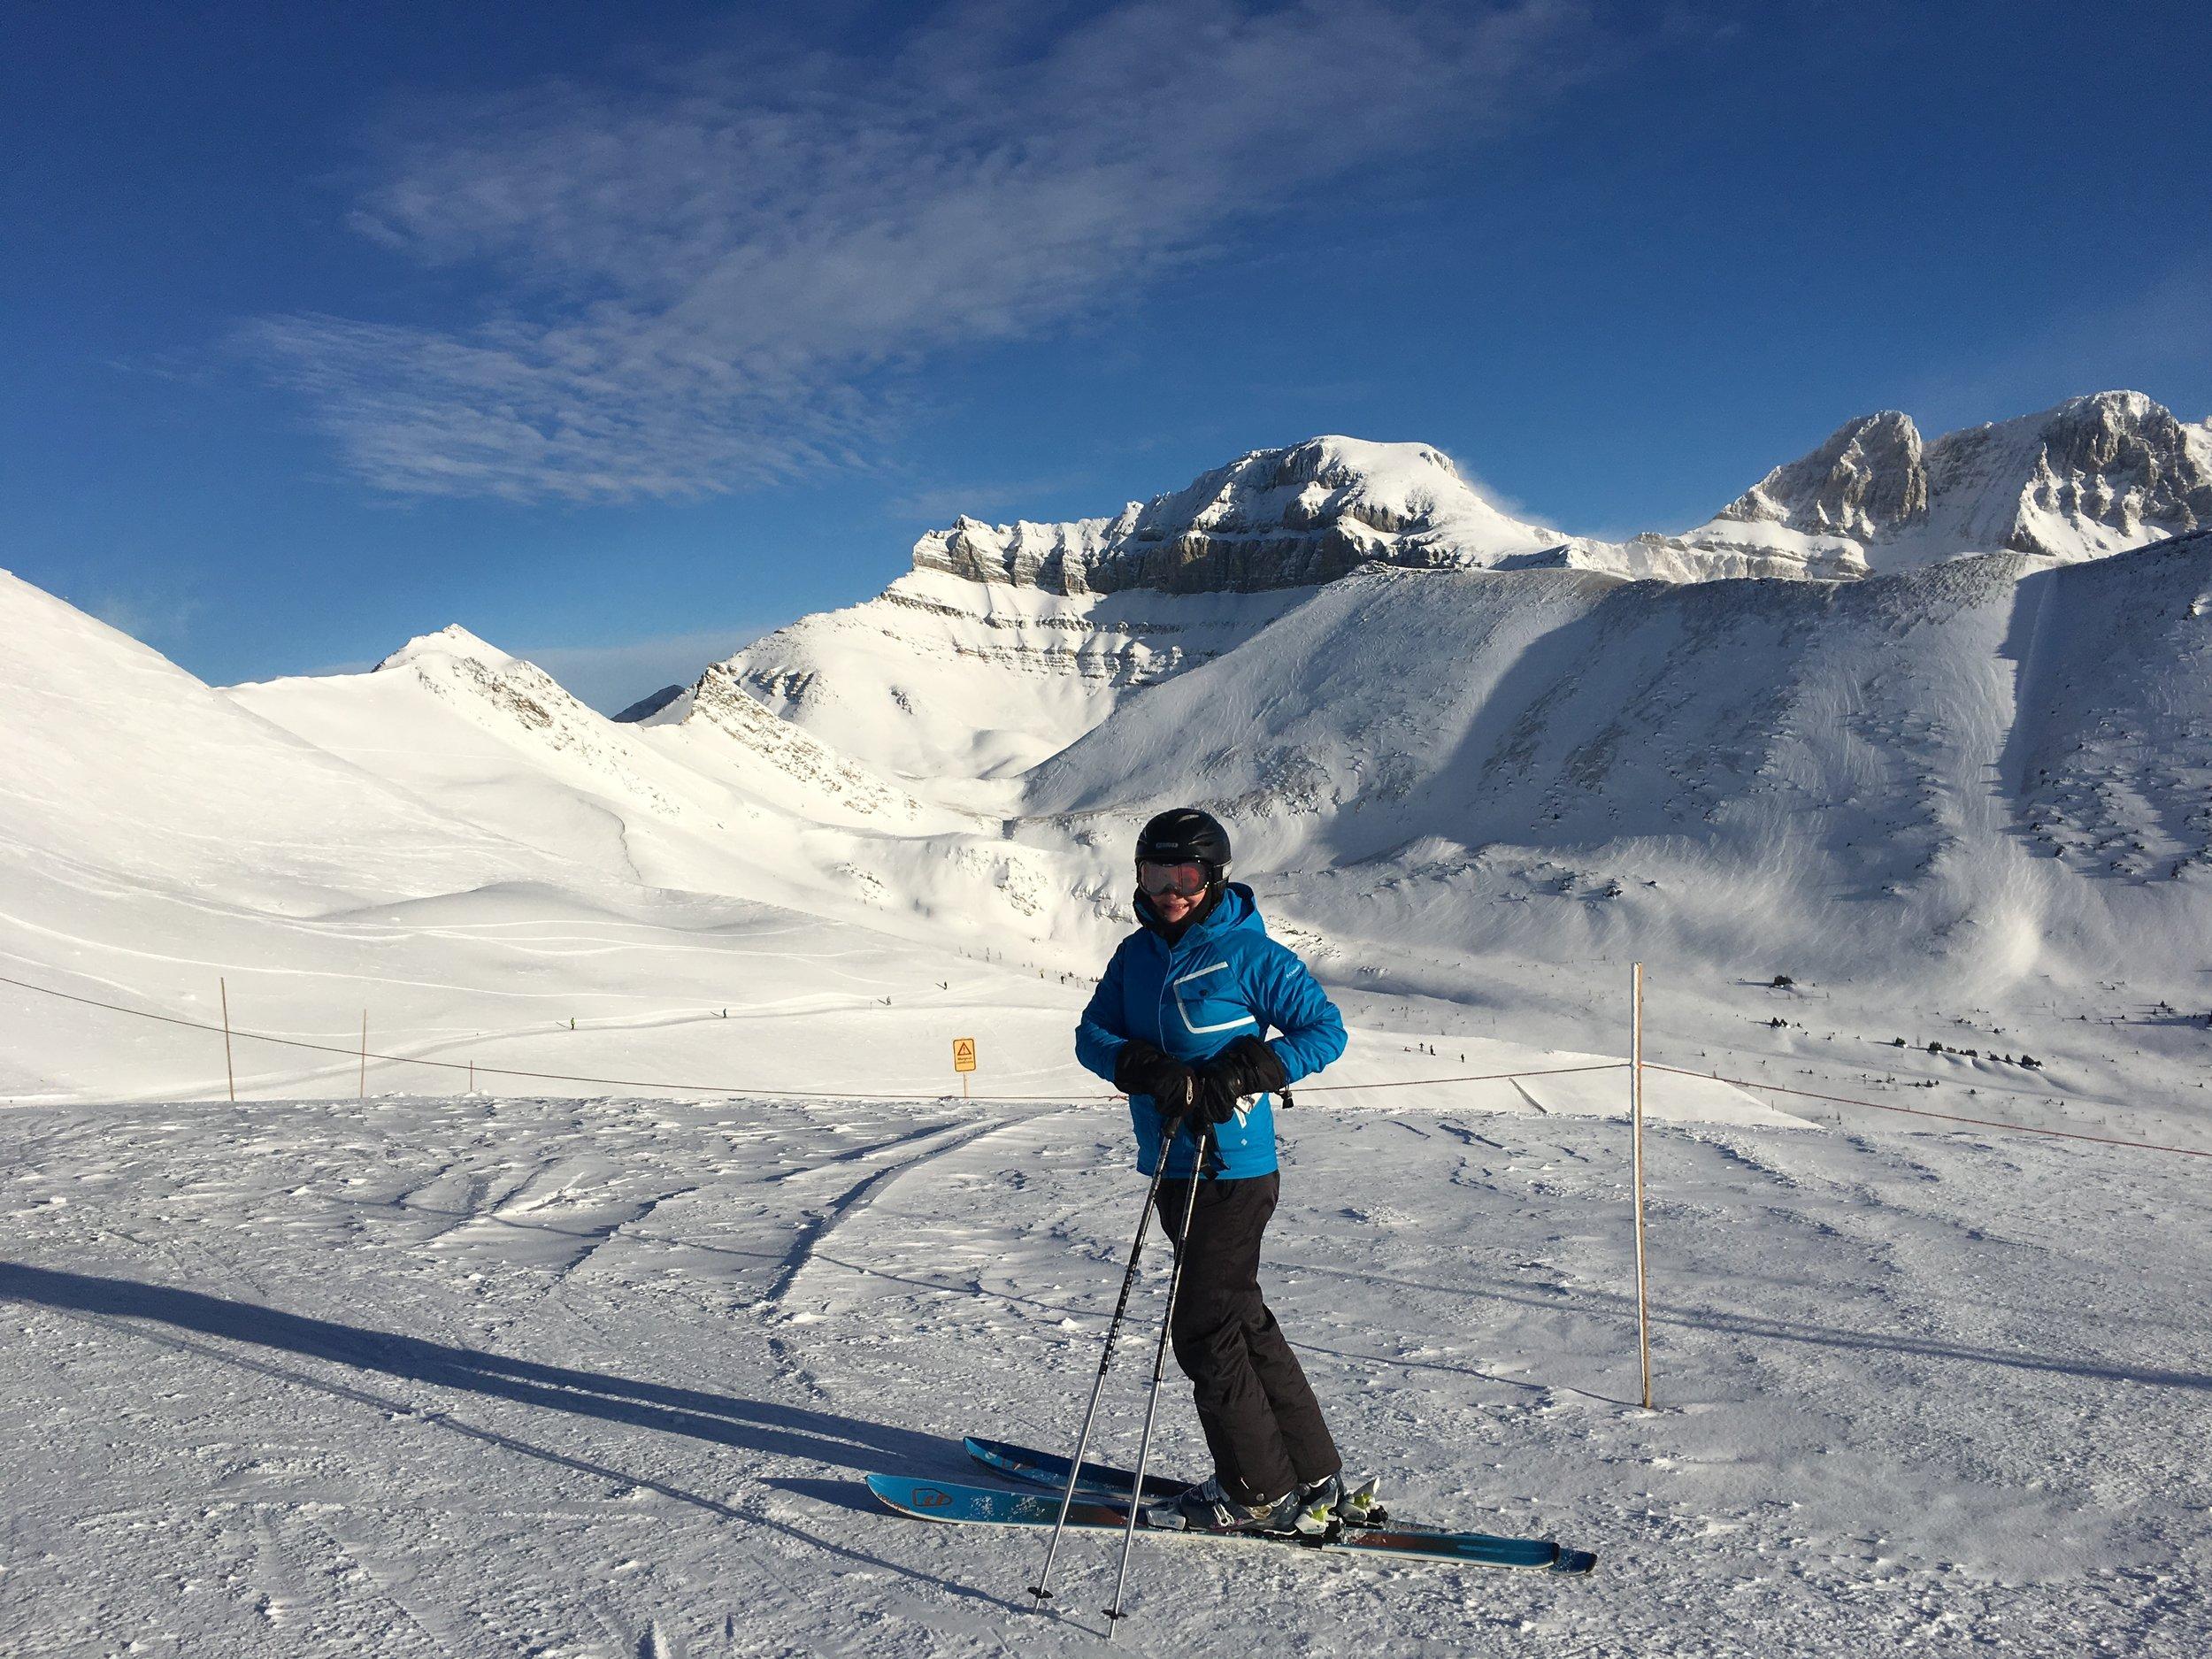 skiing_IMG_2894(1).JPG